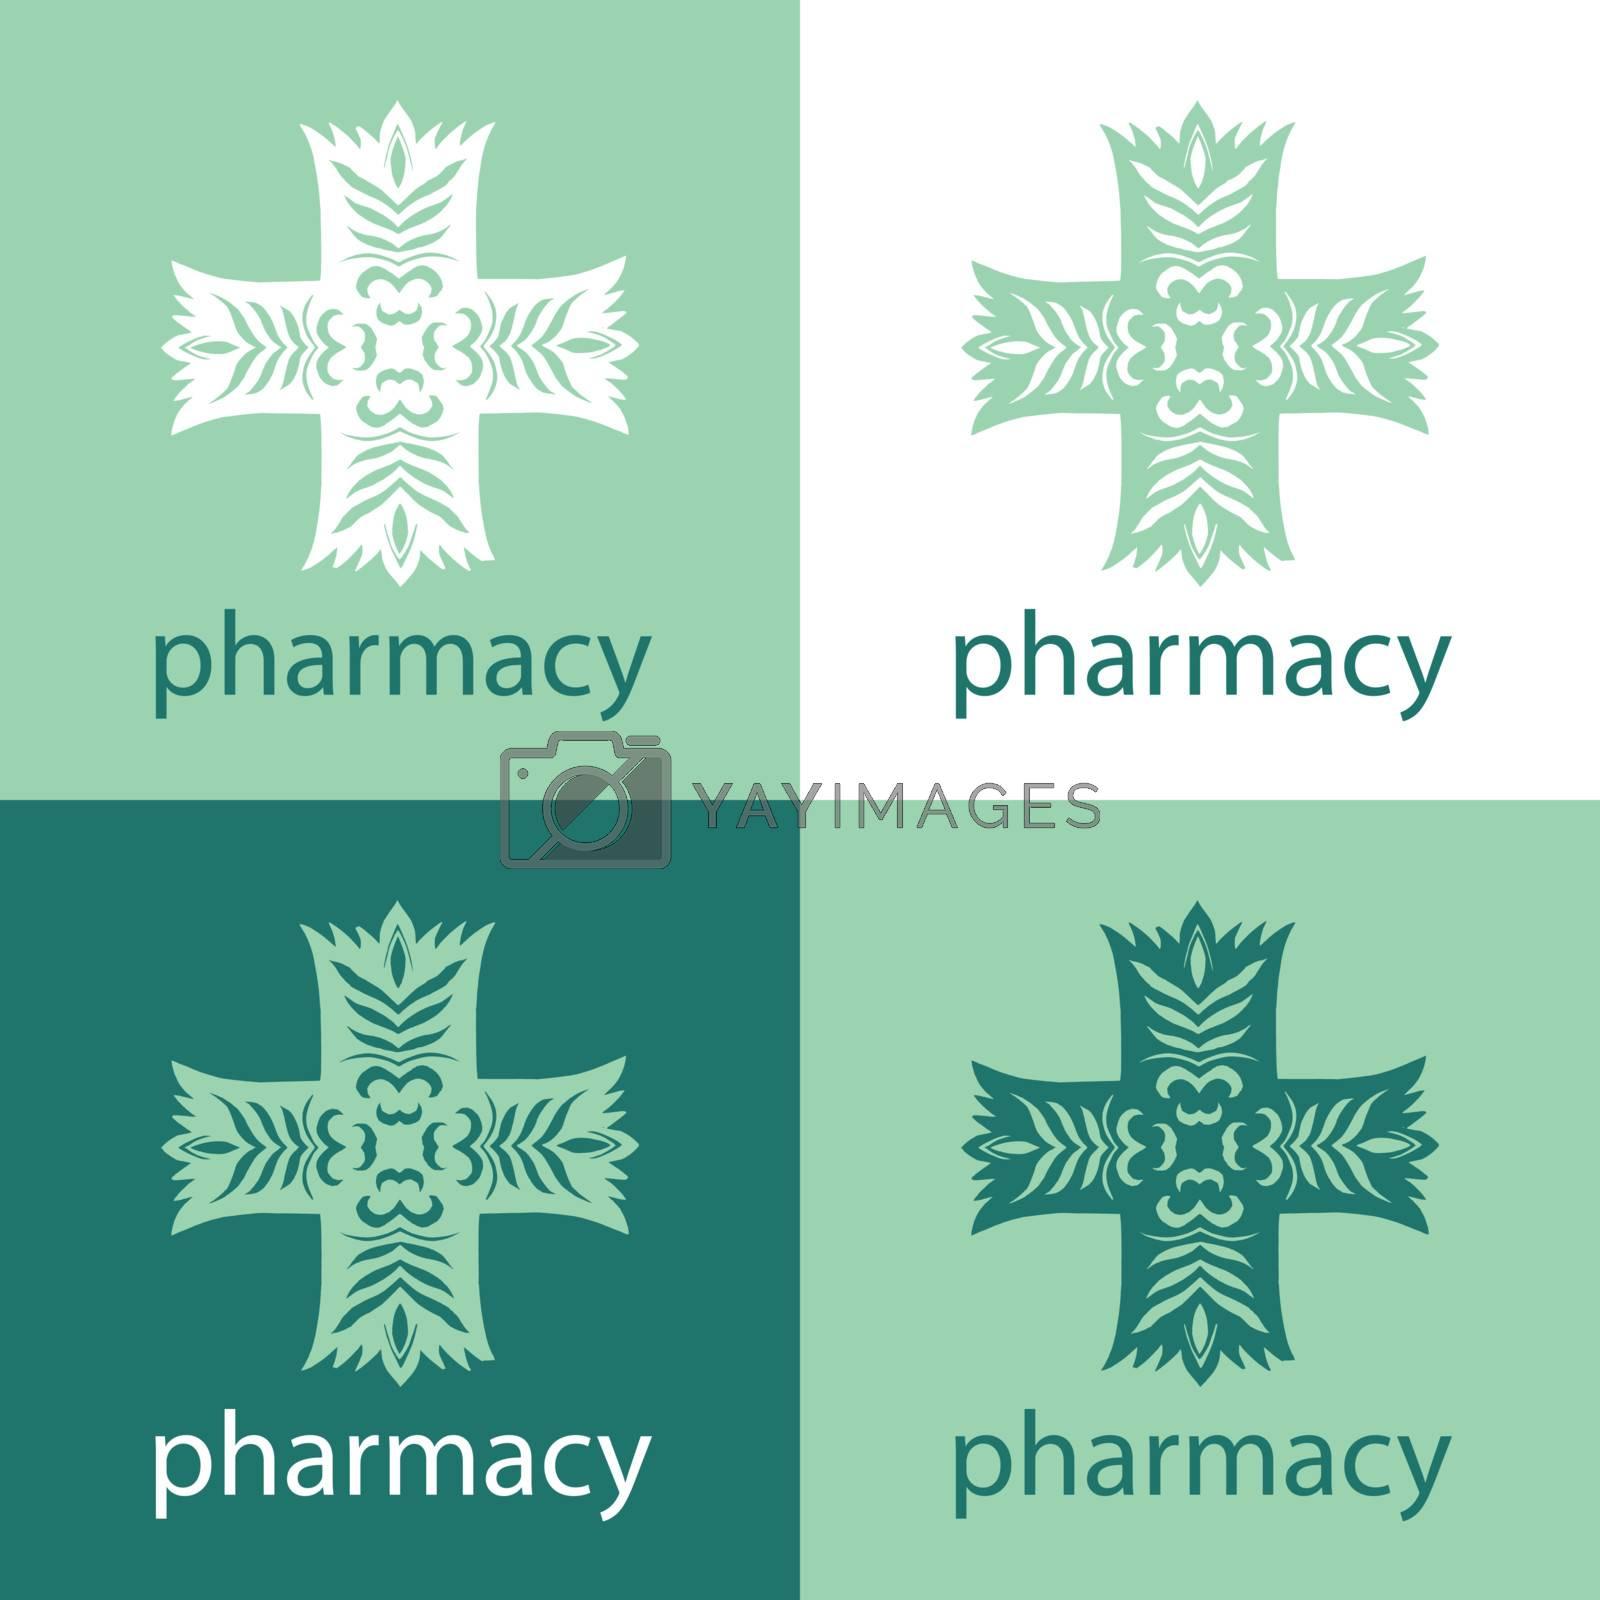 pharmacy logo by Butenkov